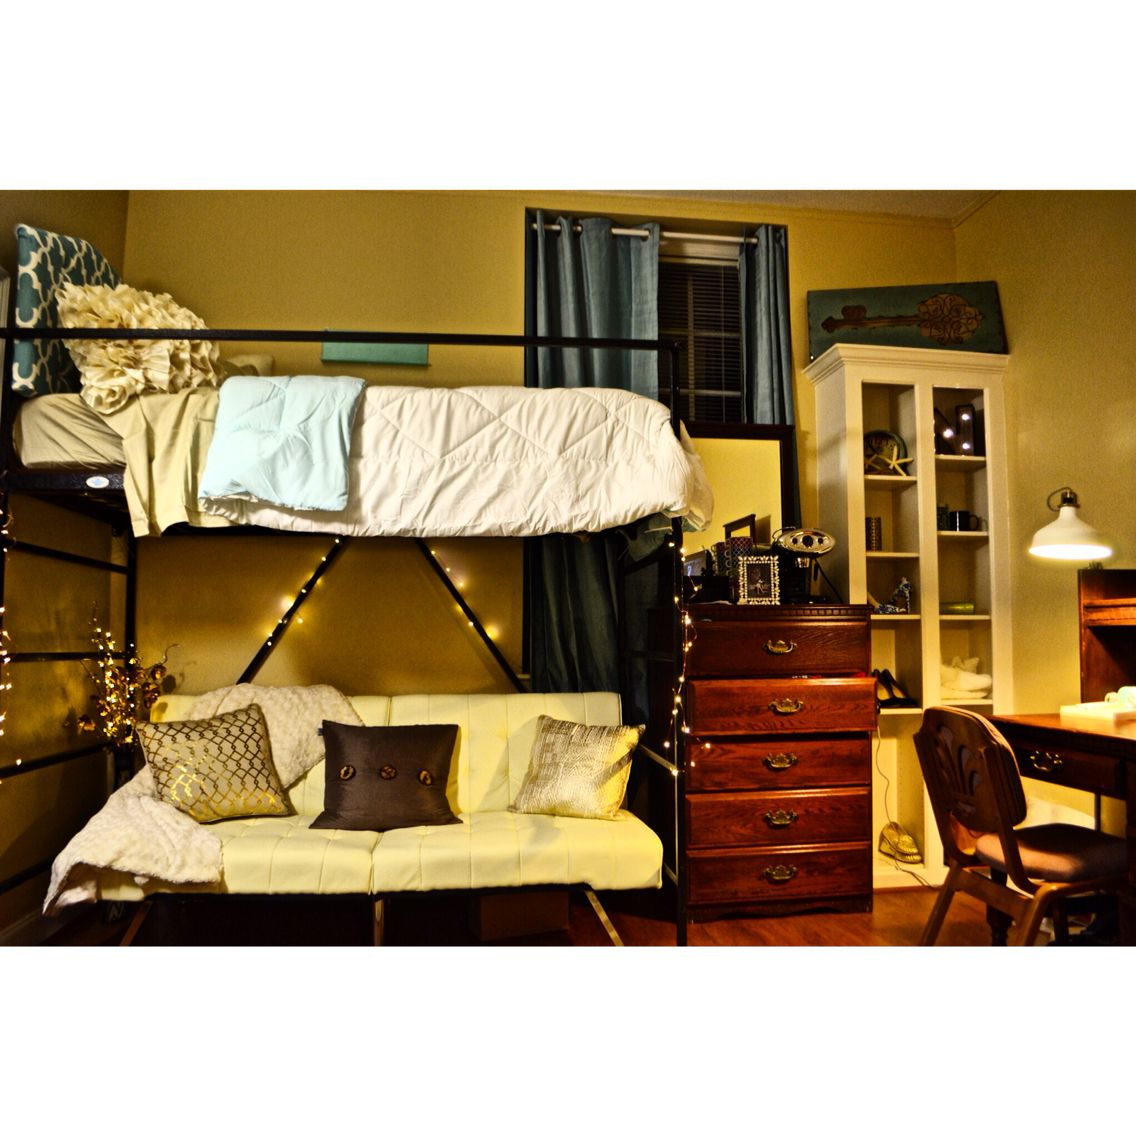 Dorm At U Of Sc Preston Residential College Usc Prestonresidential